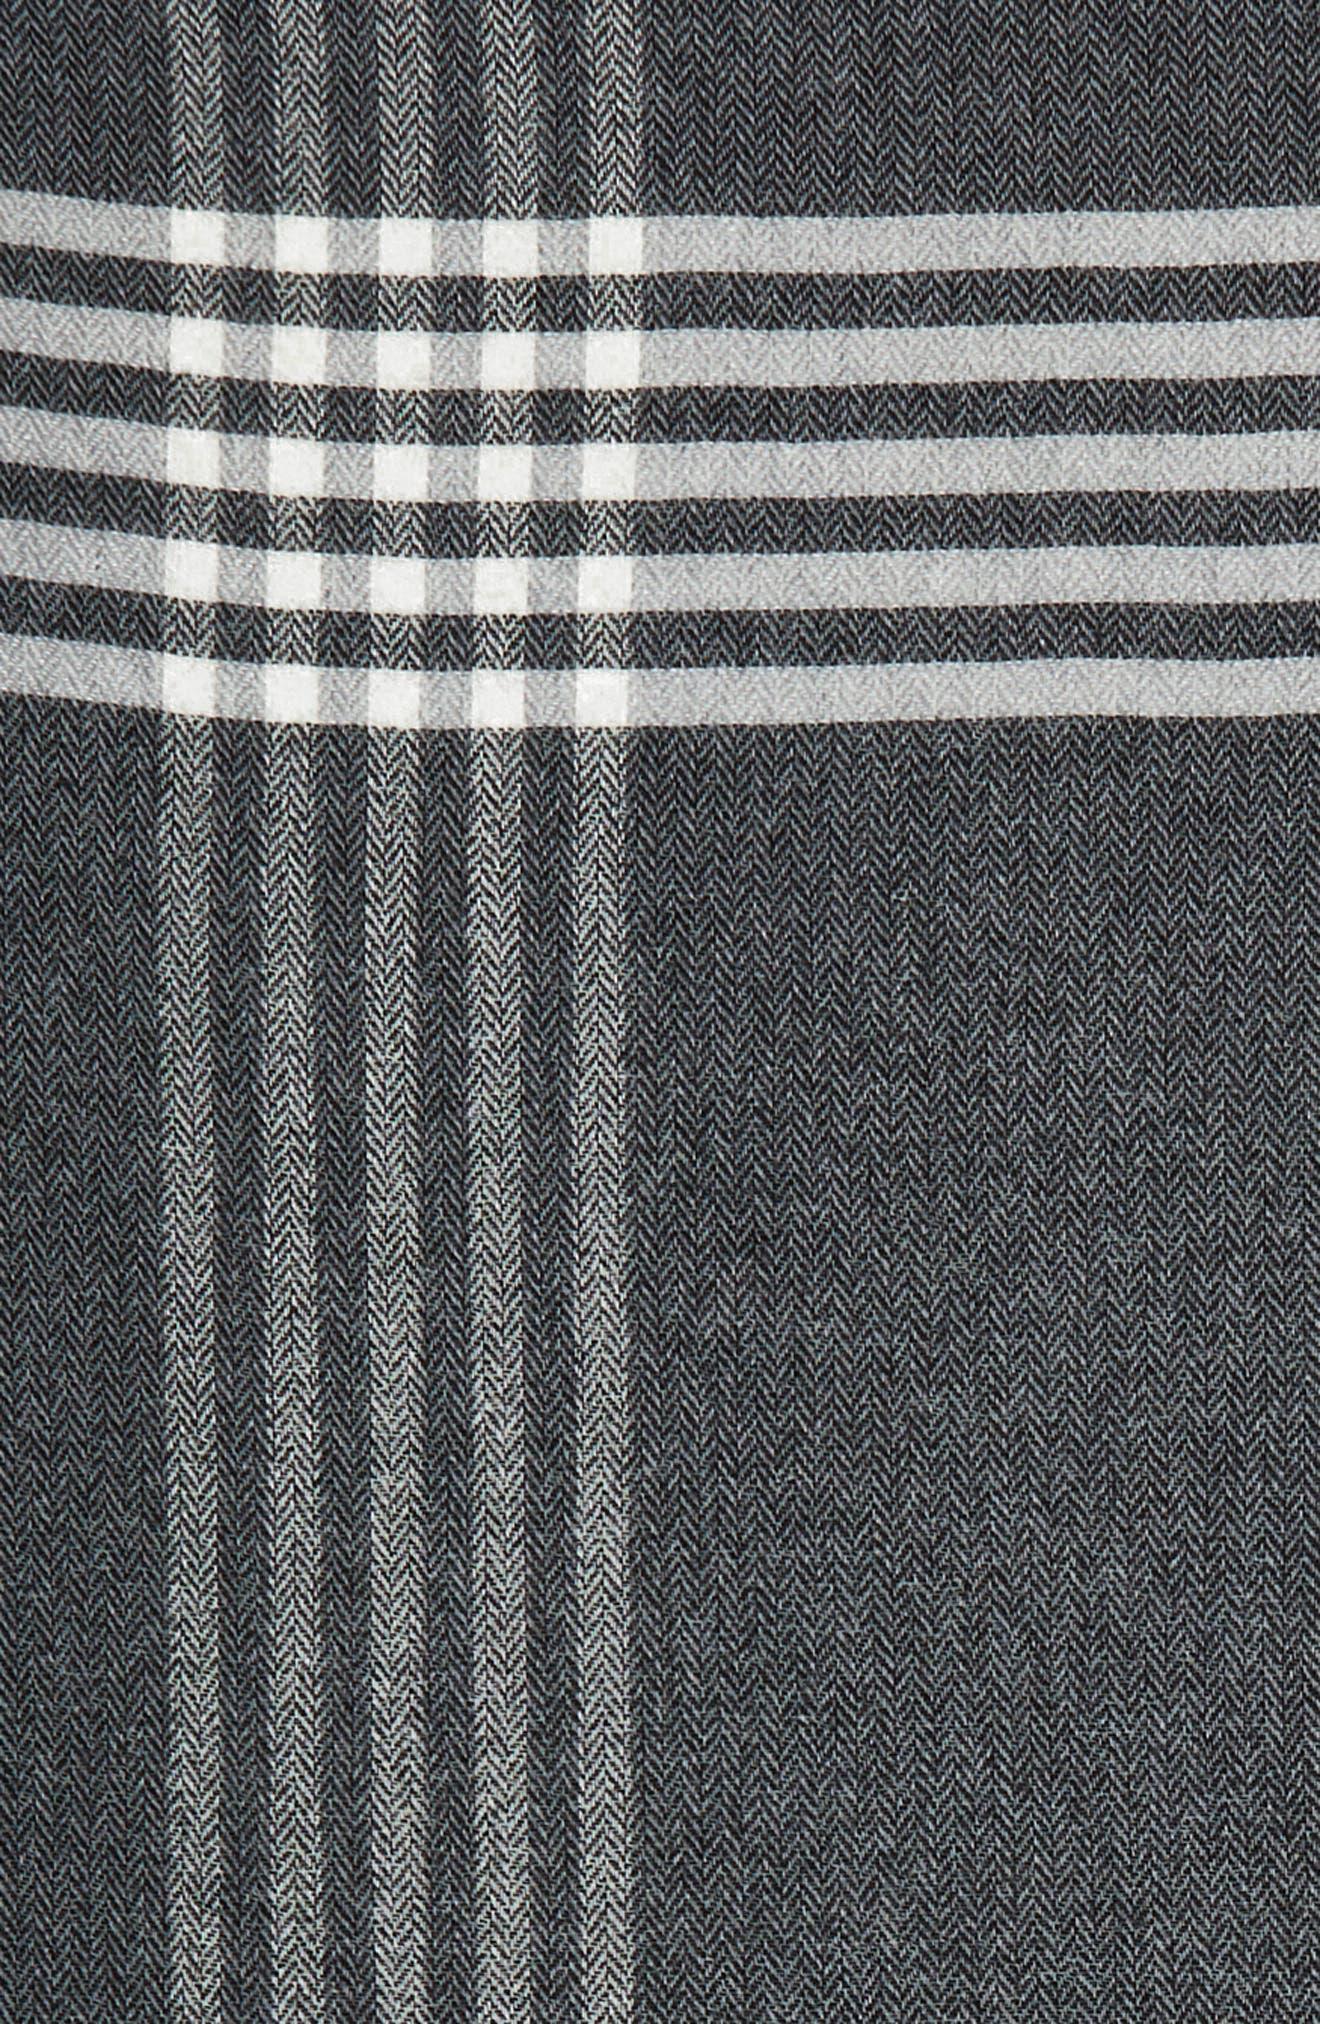 Alternate Image 3  - Eileen Fisher Plaid Wool Blend Scarf